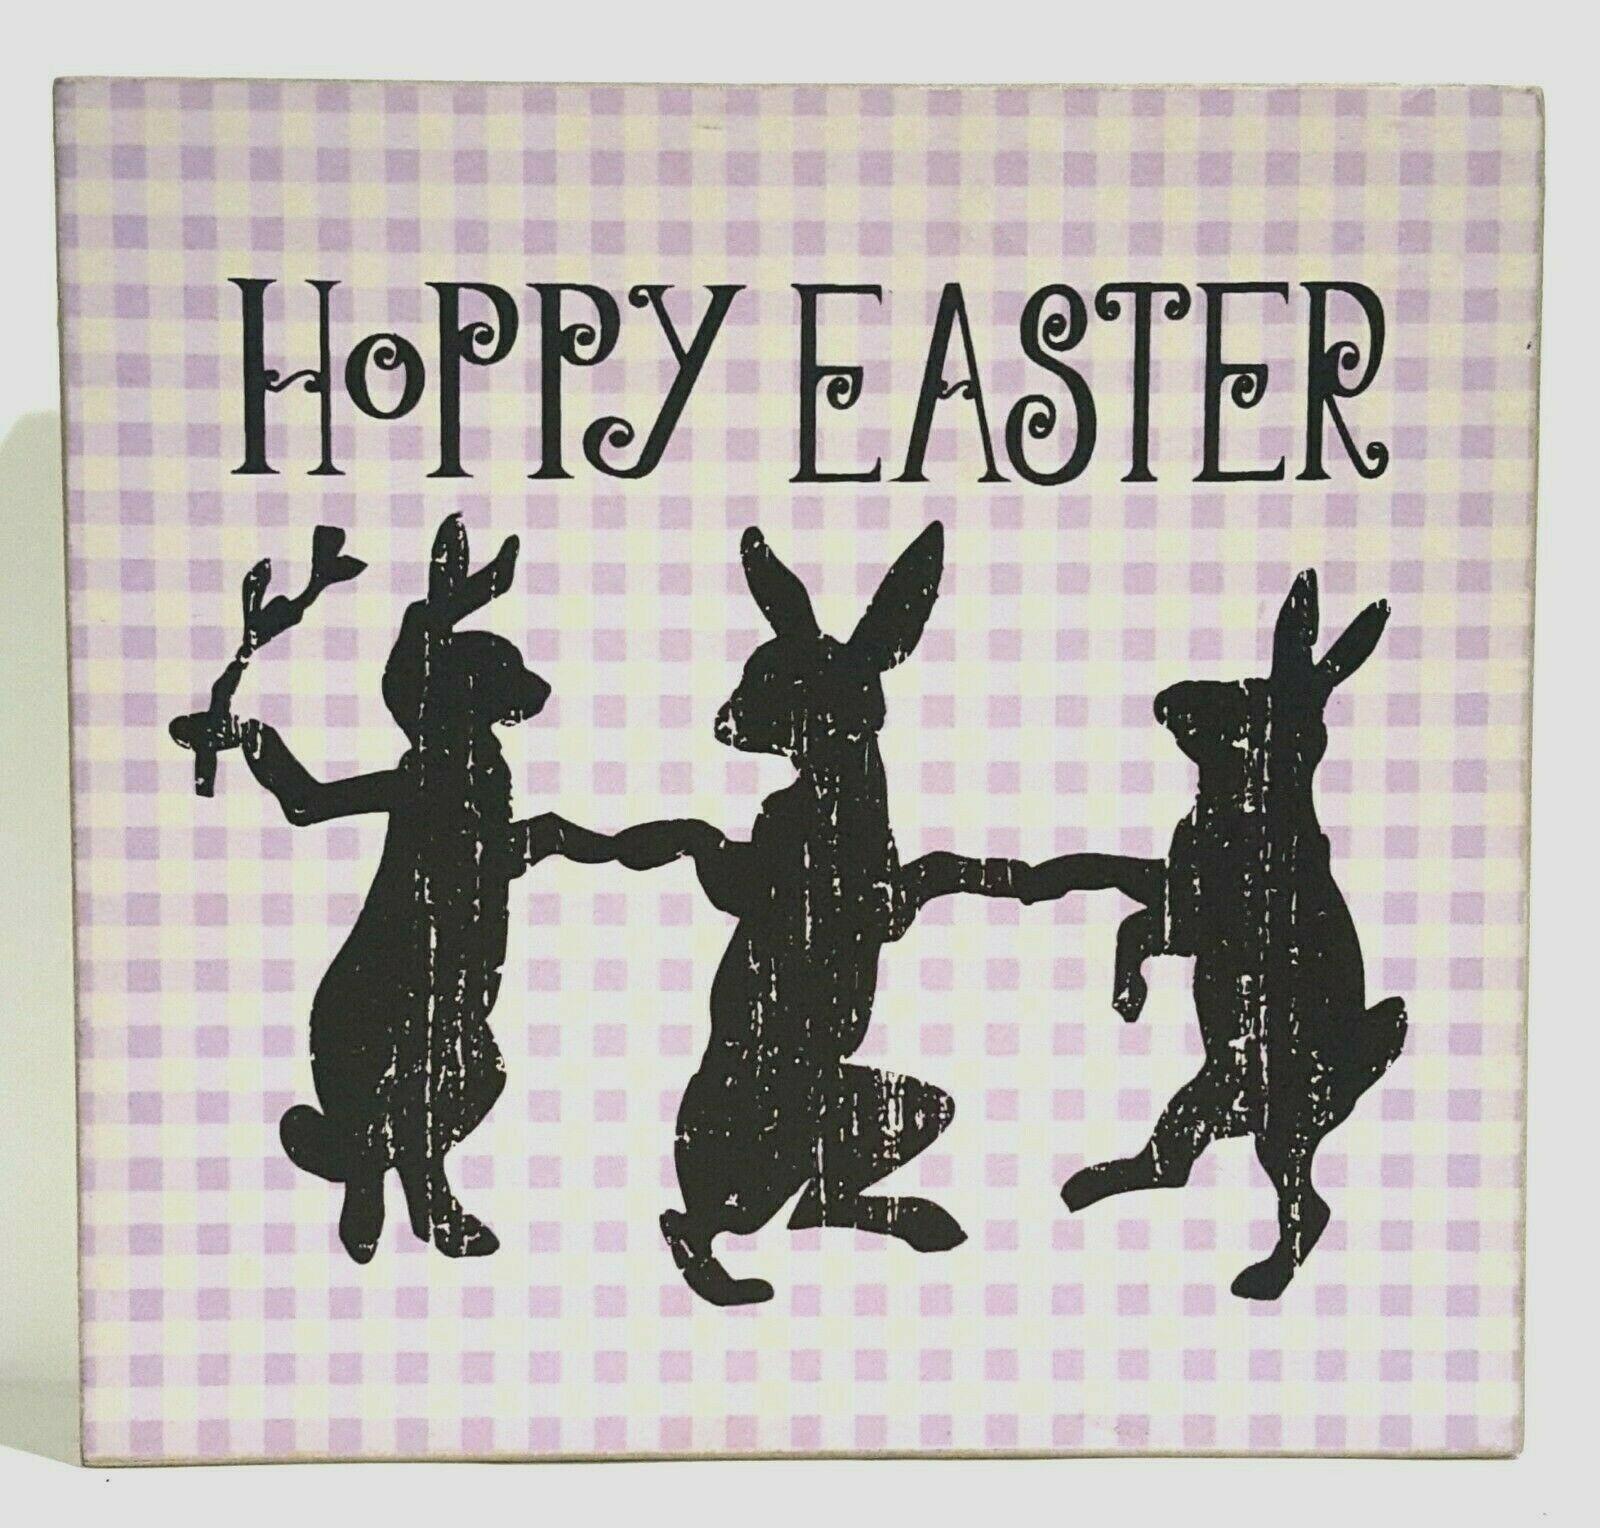 https://www.ebay.com/str/bizylizy2/Easter/_i.html?_storecat=9829914013